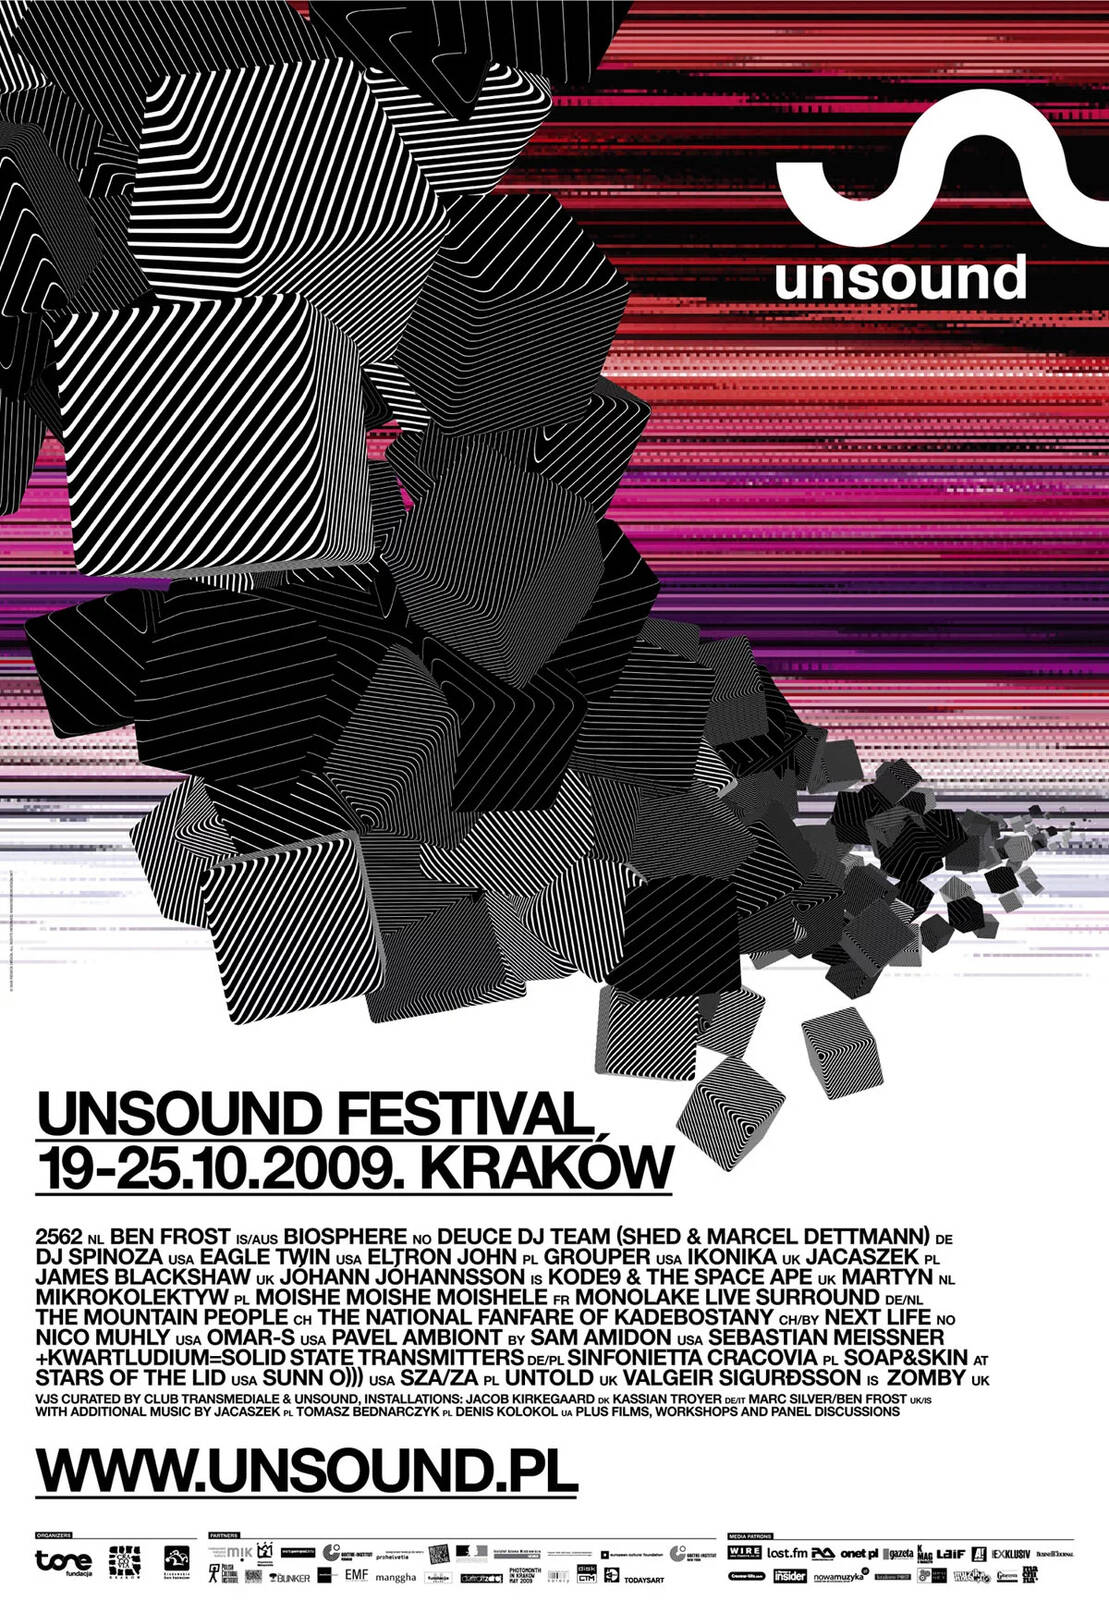 Unsound Kraków 2009 poster